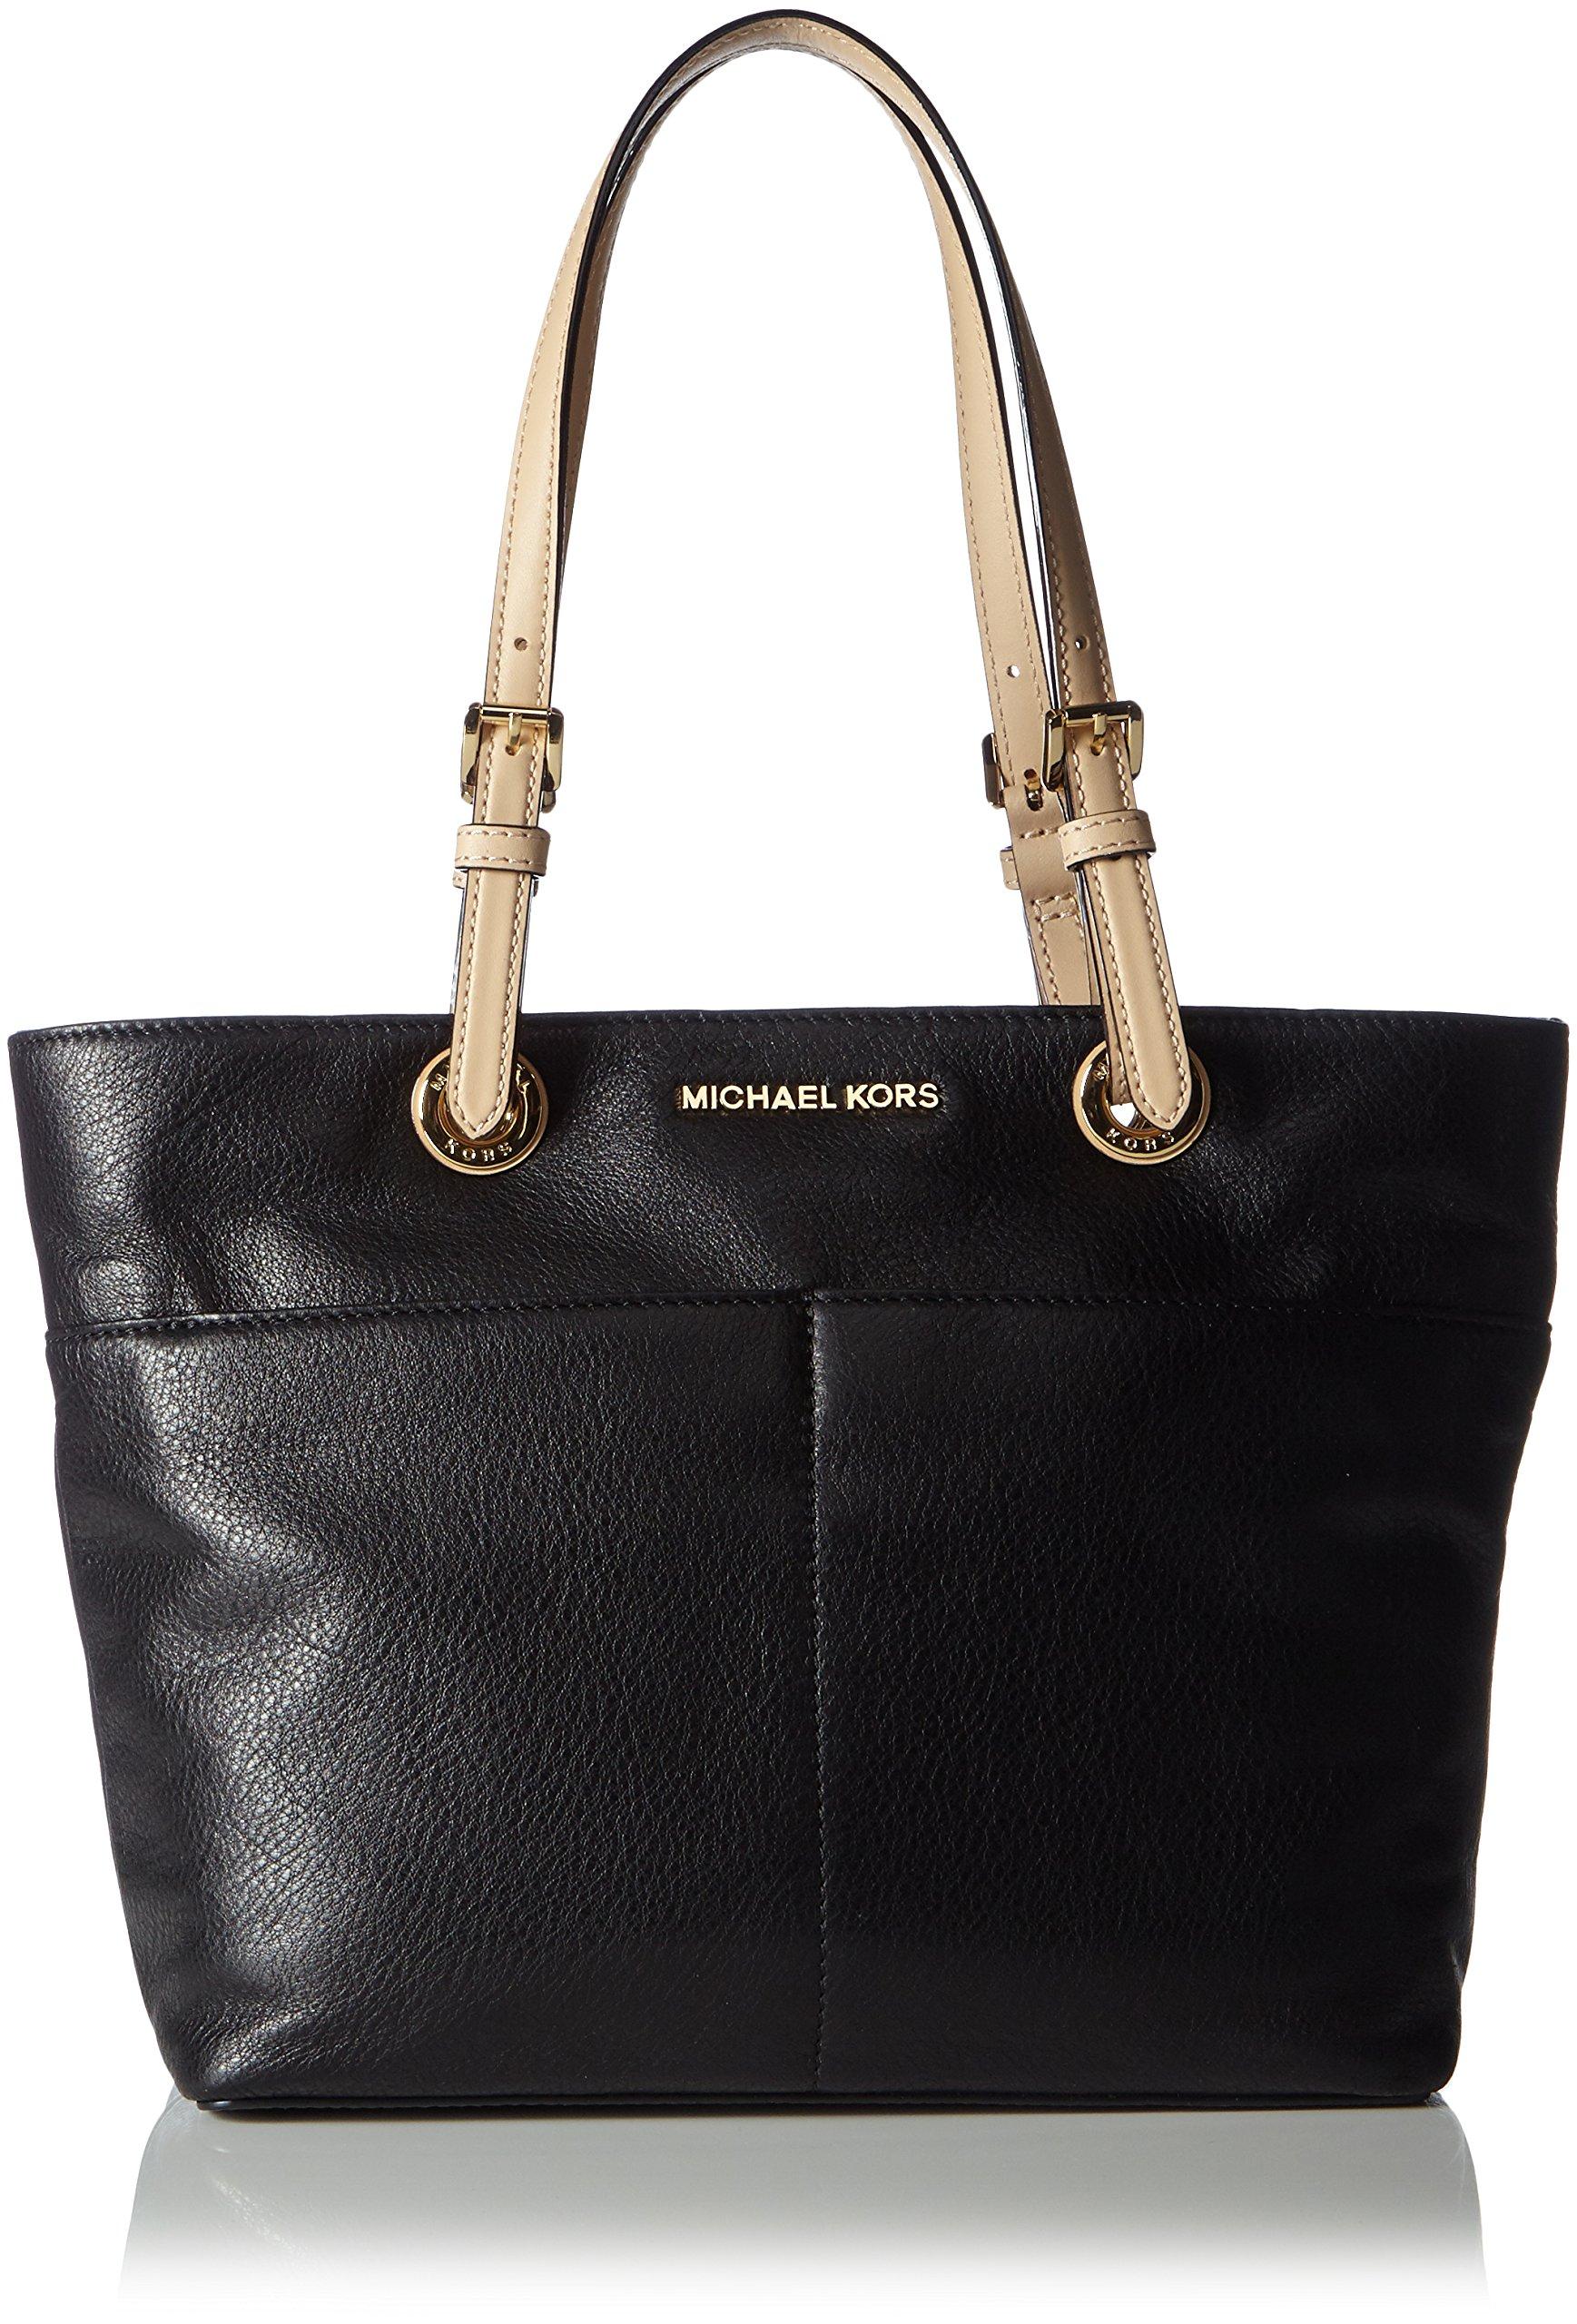 Best Rated in Women s Top-Handle Handbags   Helpful Customer Reviews ... 3ad4680921722